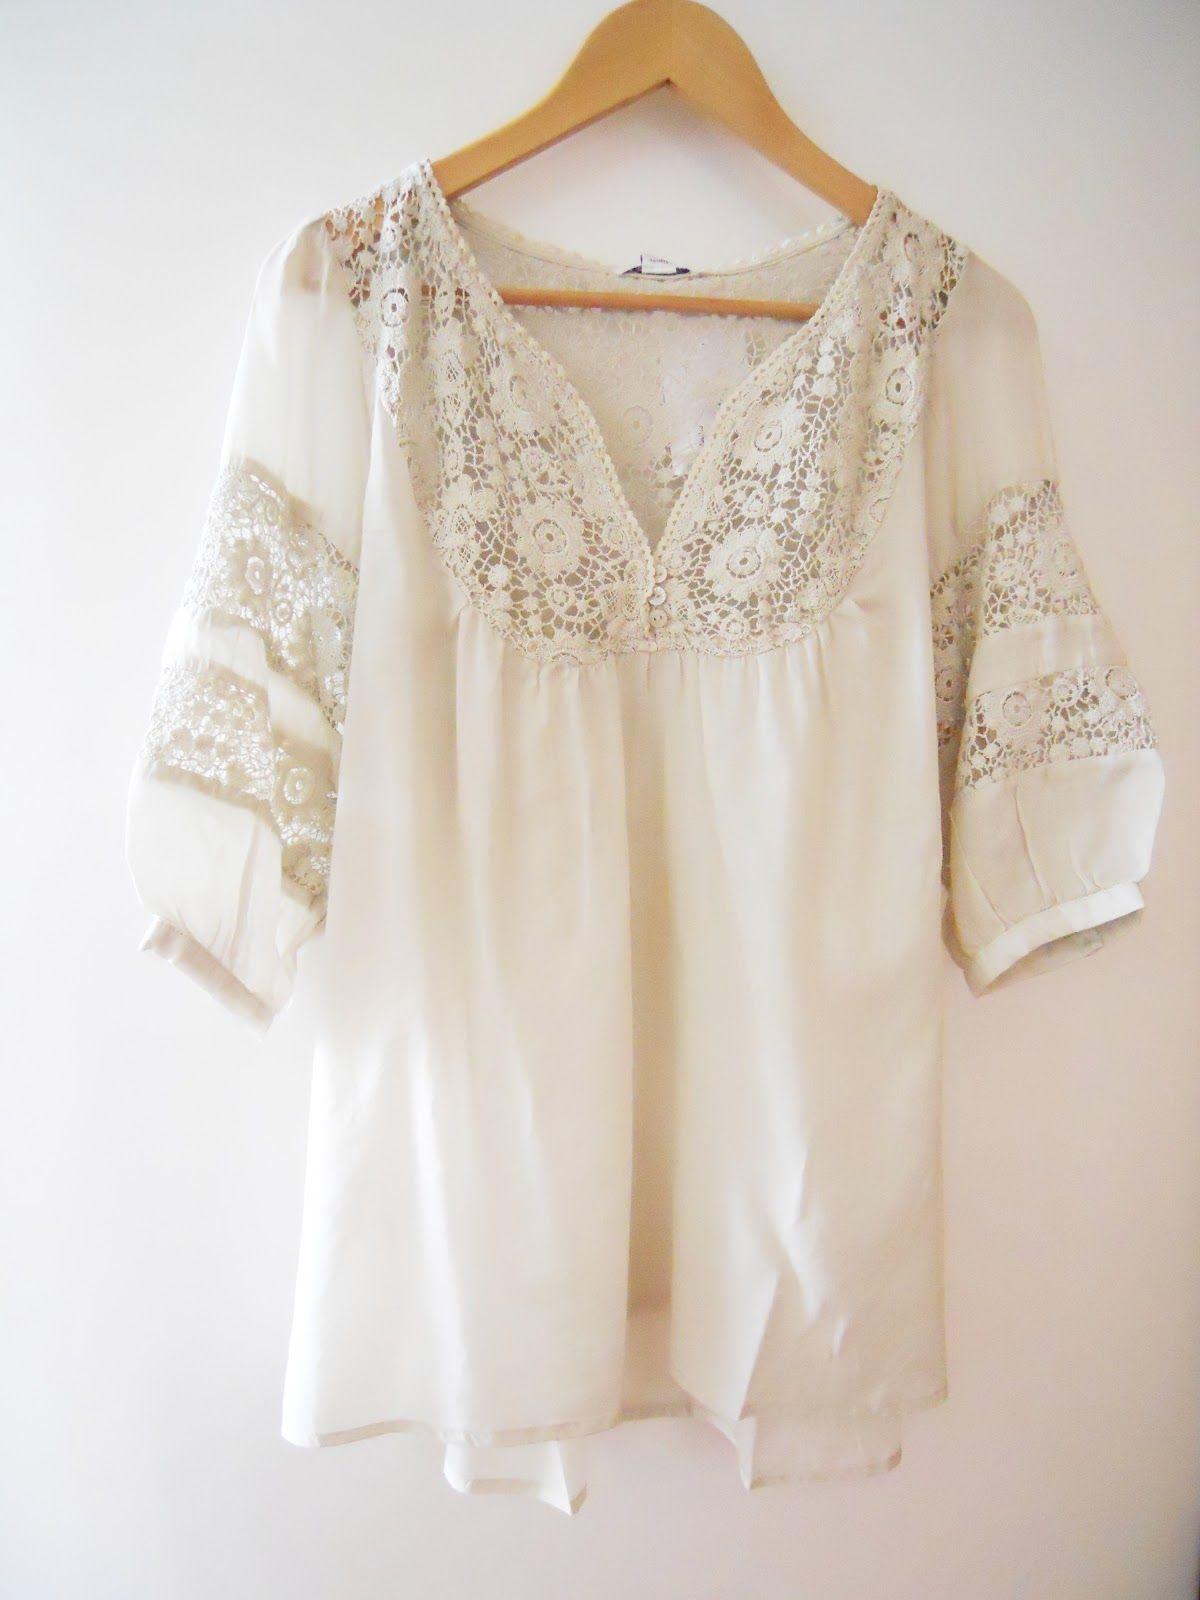 c76f8674923 blouse #2dayslook #new #style www.2dayslook.com   shopaholic ...